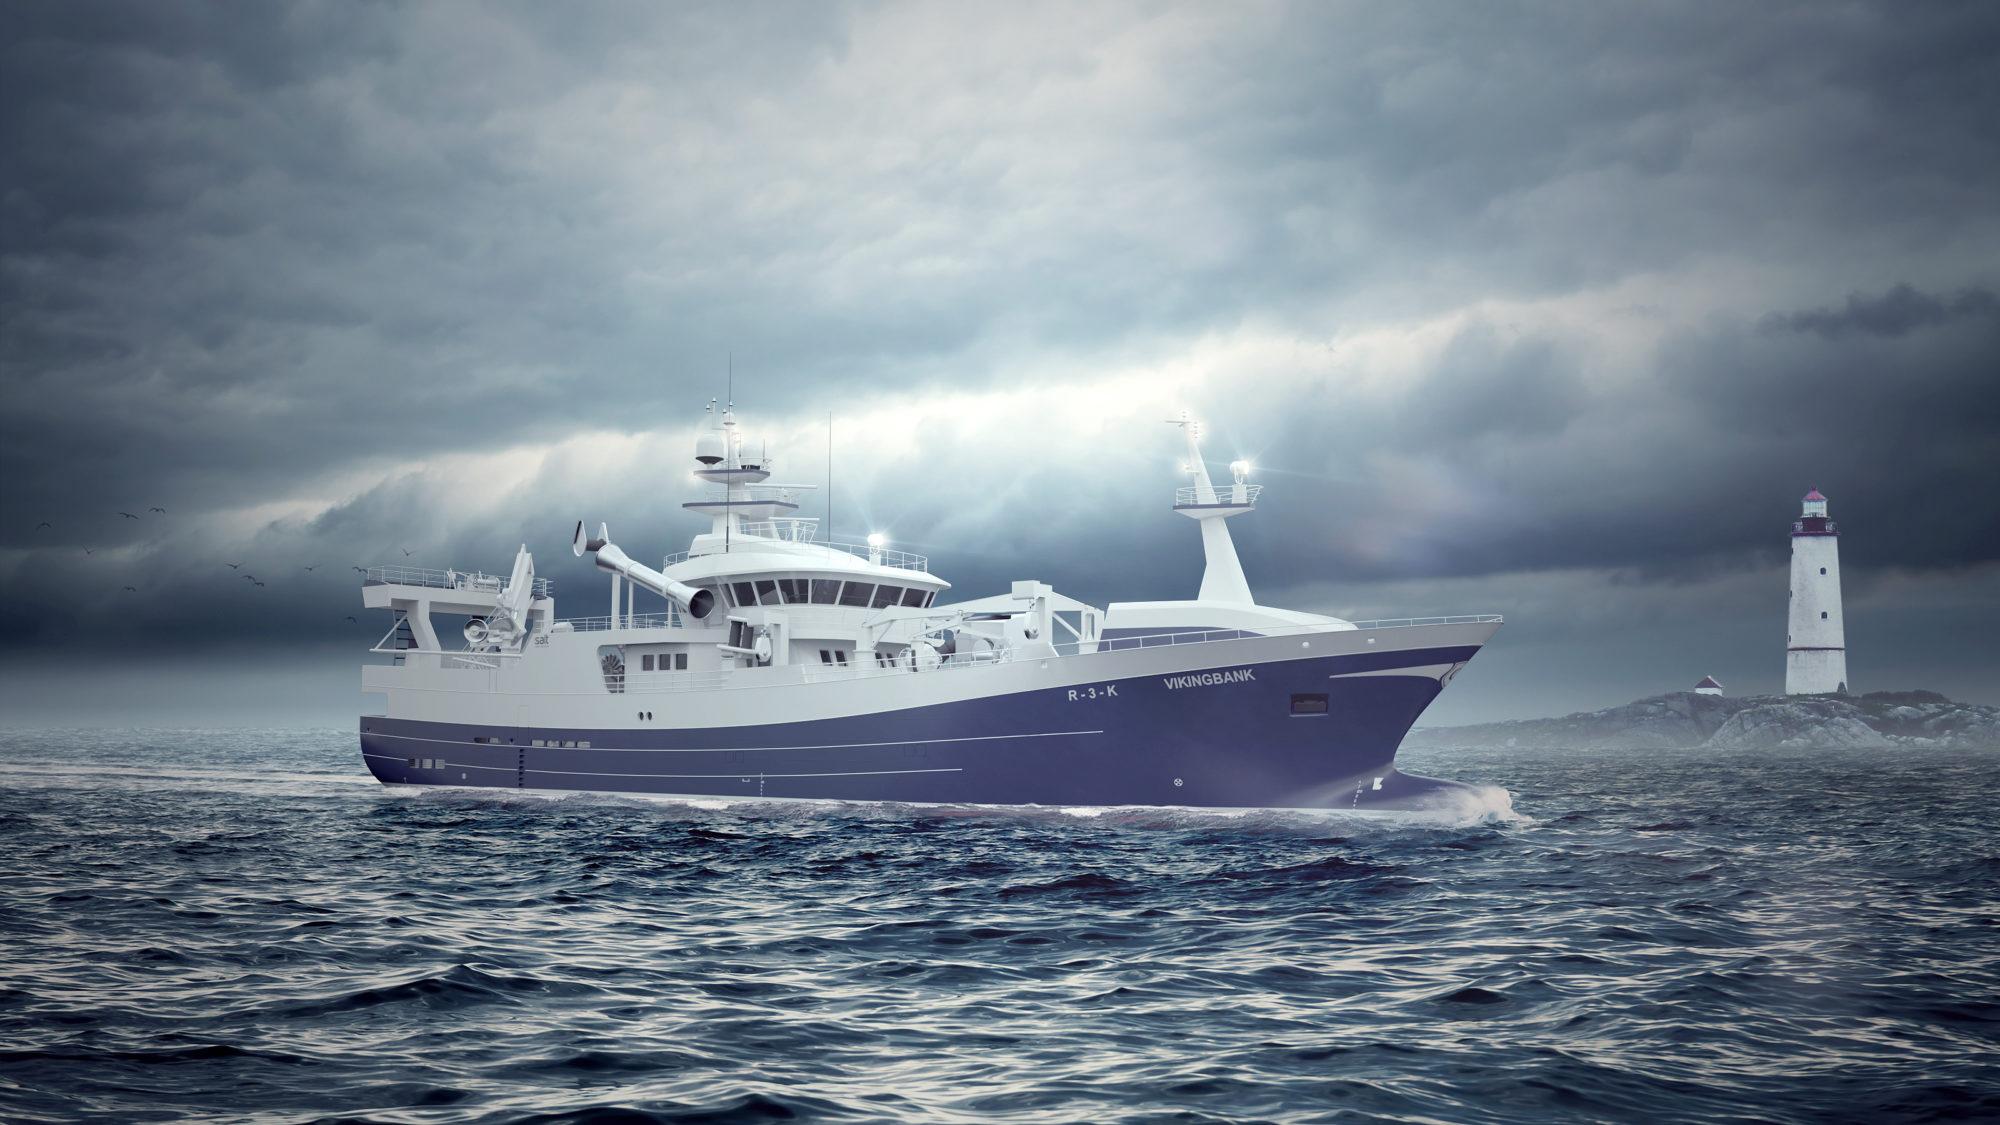 Trawler Vikingbank